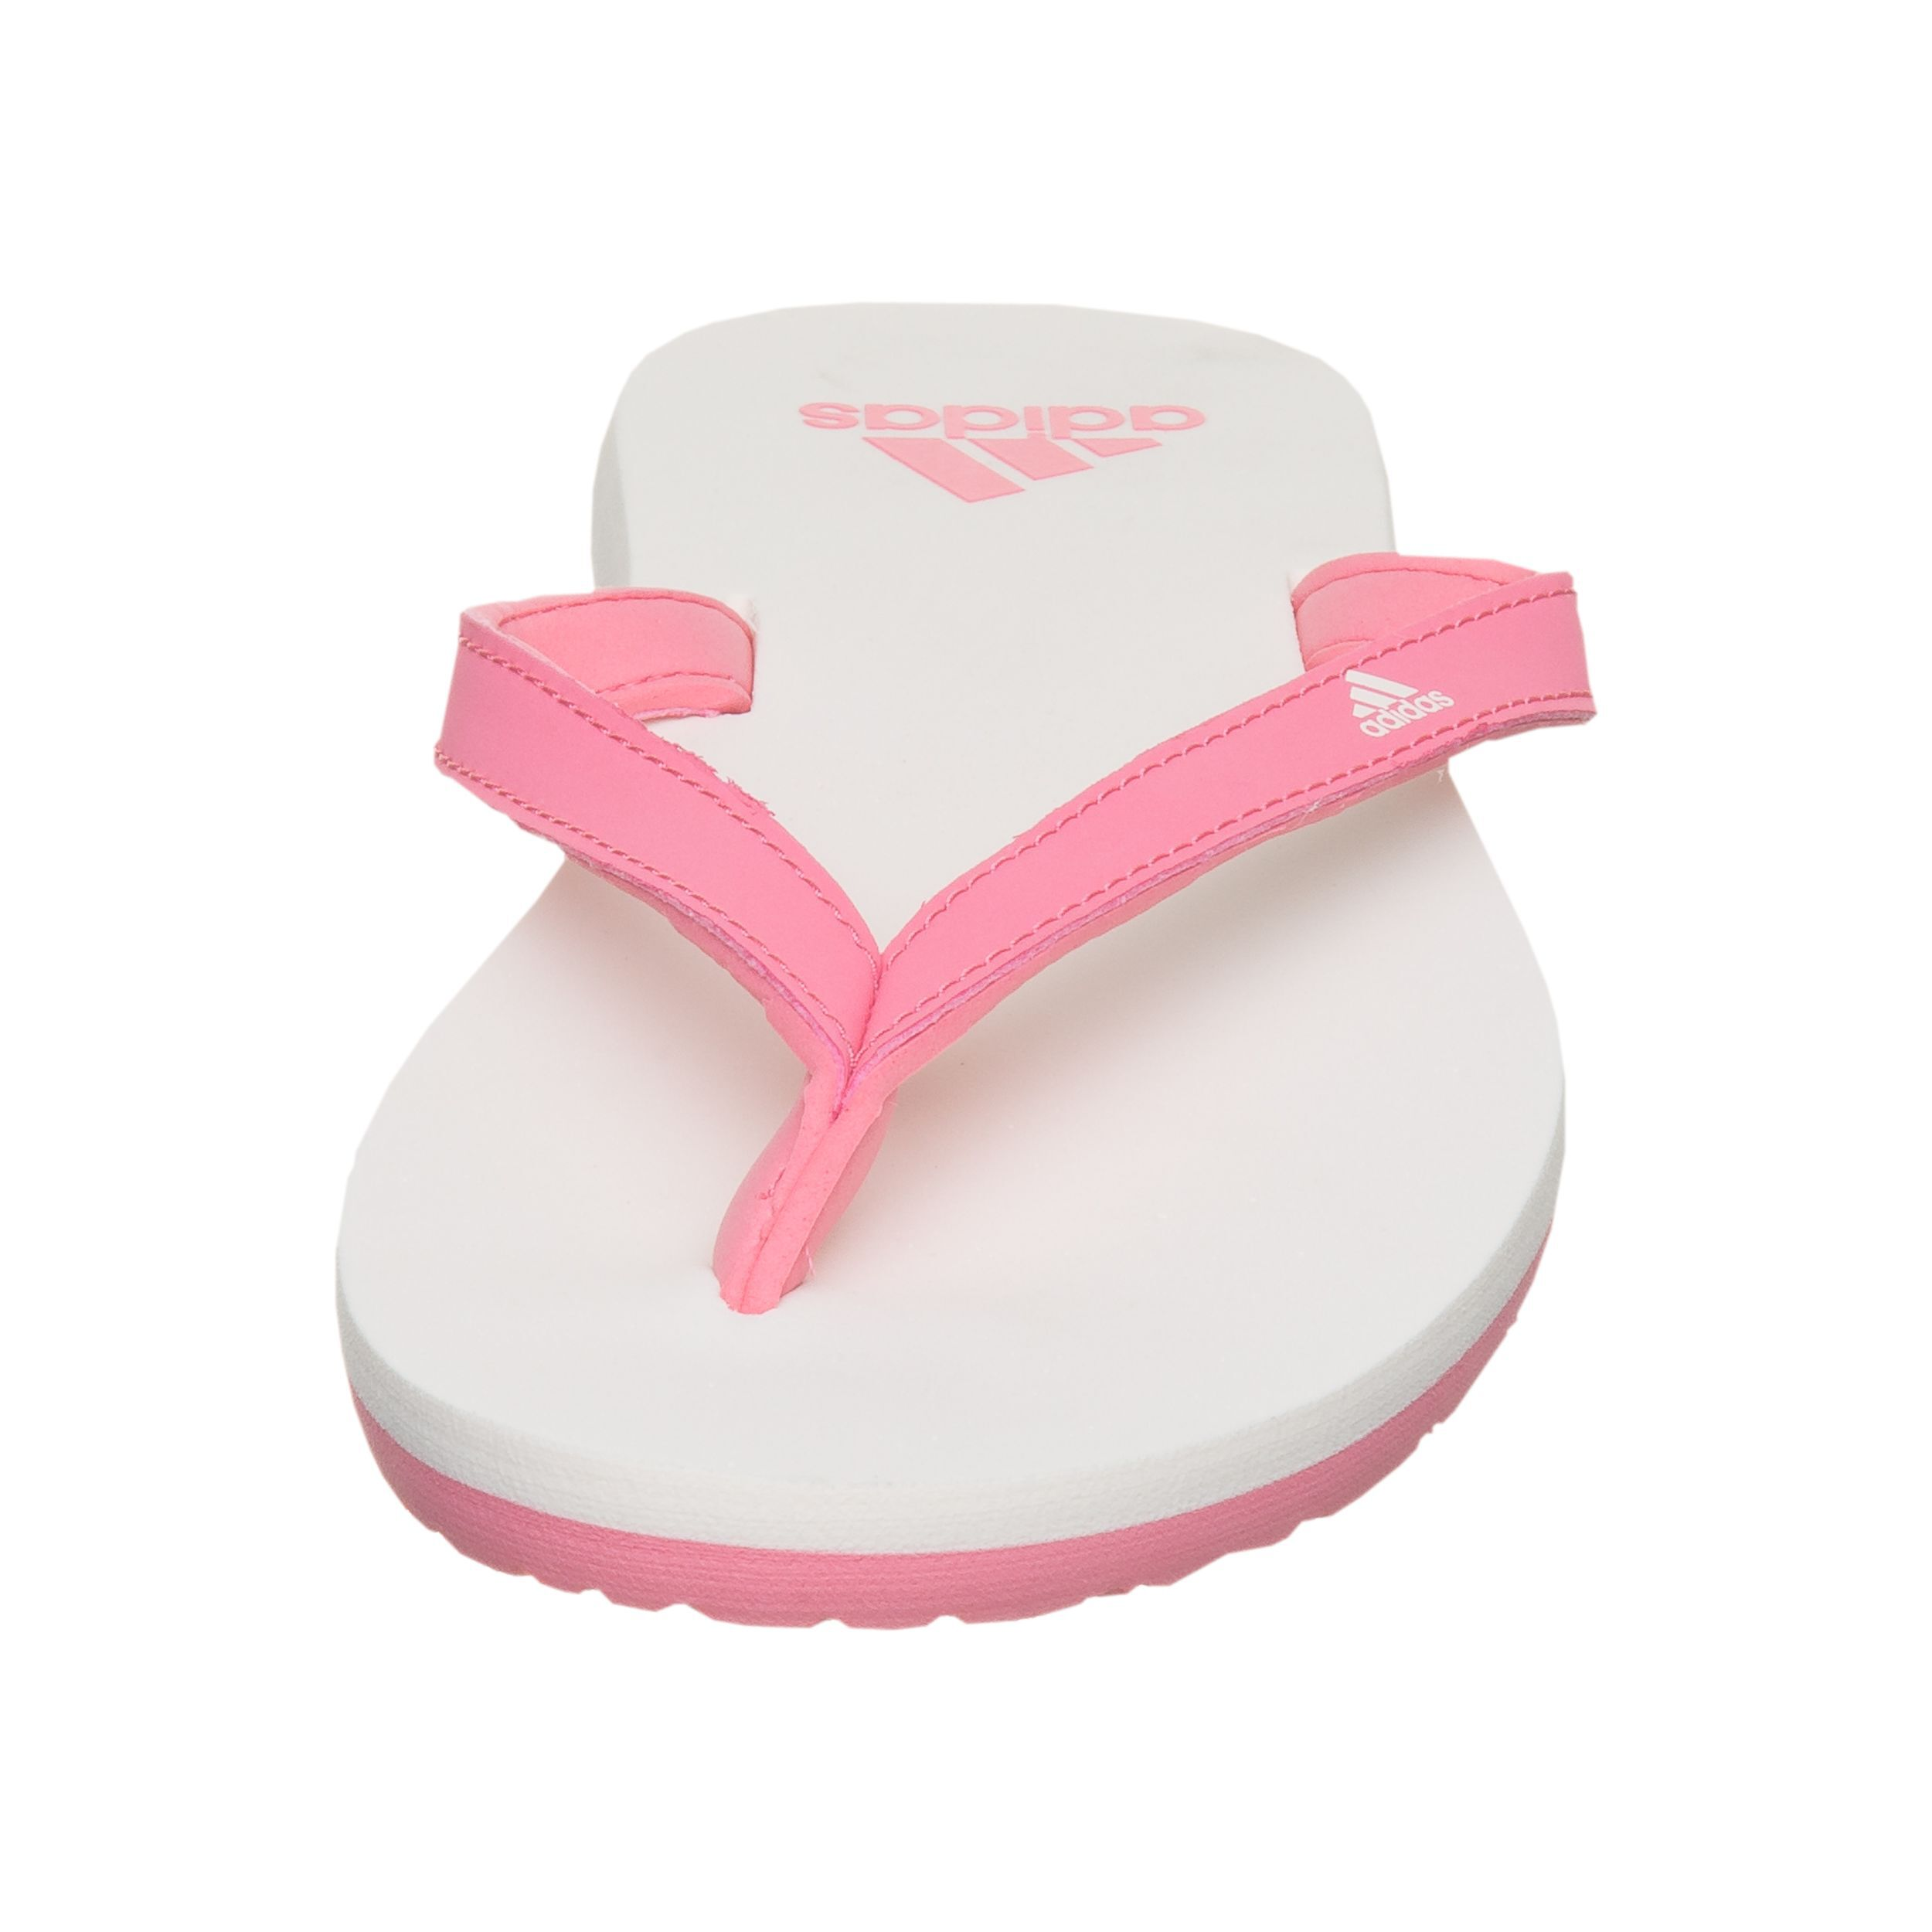 adidas Eezay Essence Flip Flop Damen Rosa, Weiß online